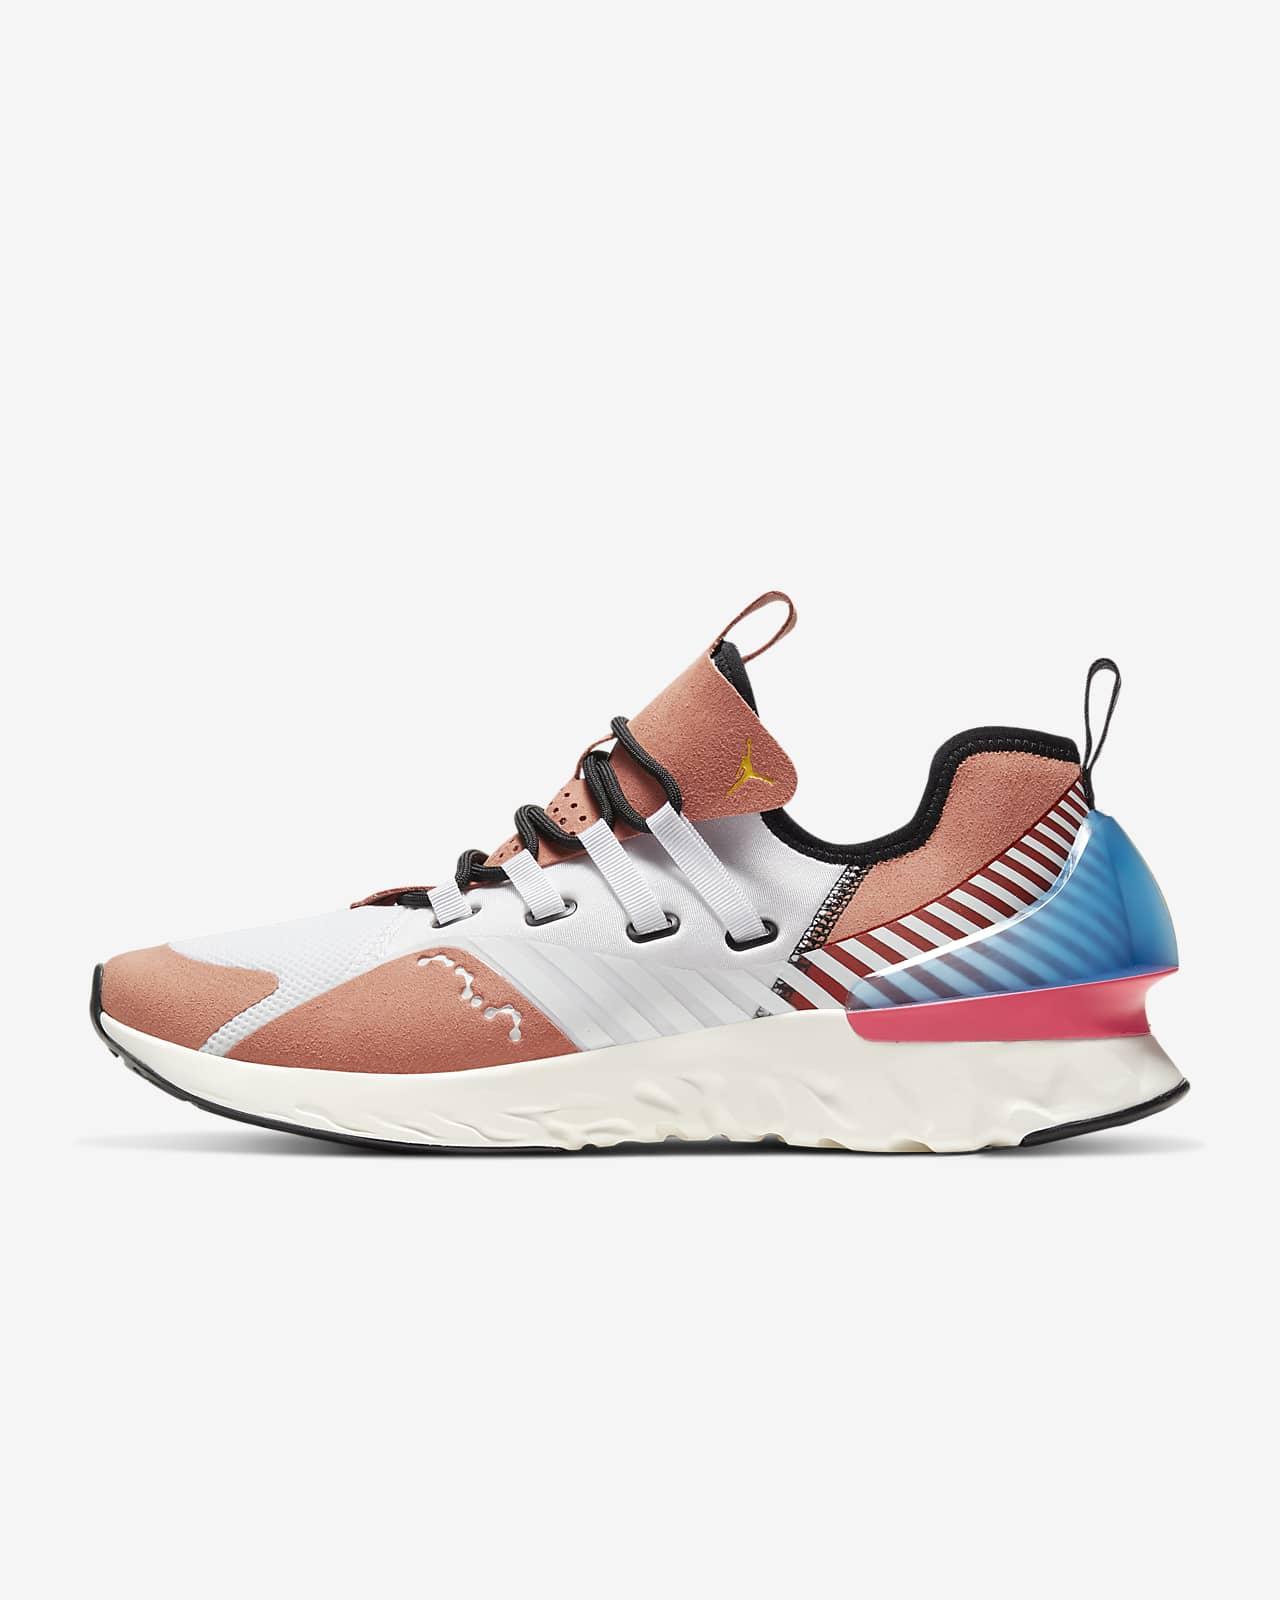 Calzado de running Jordan React Havoc SE